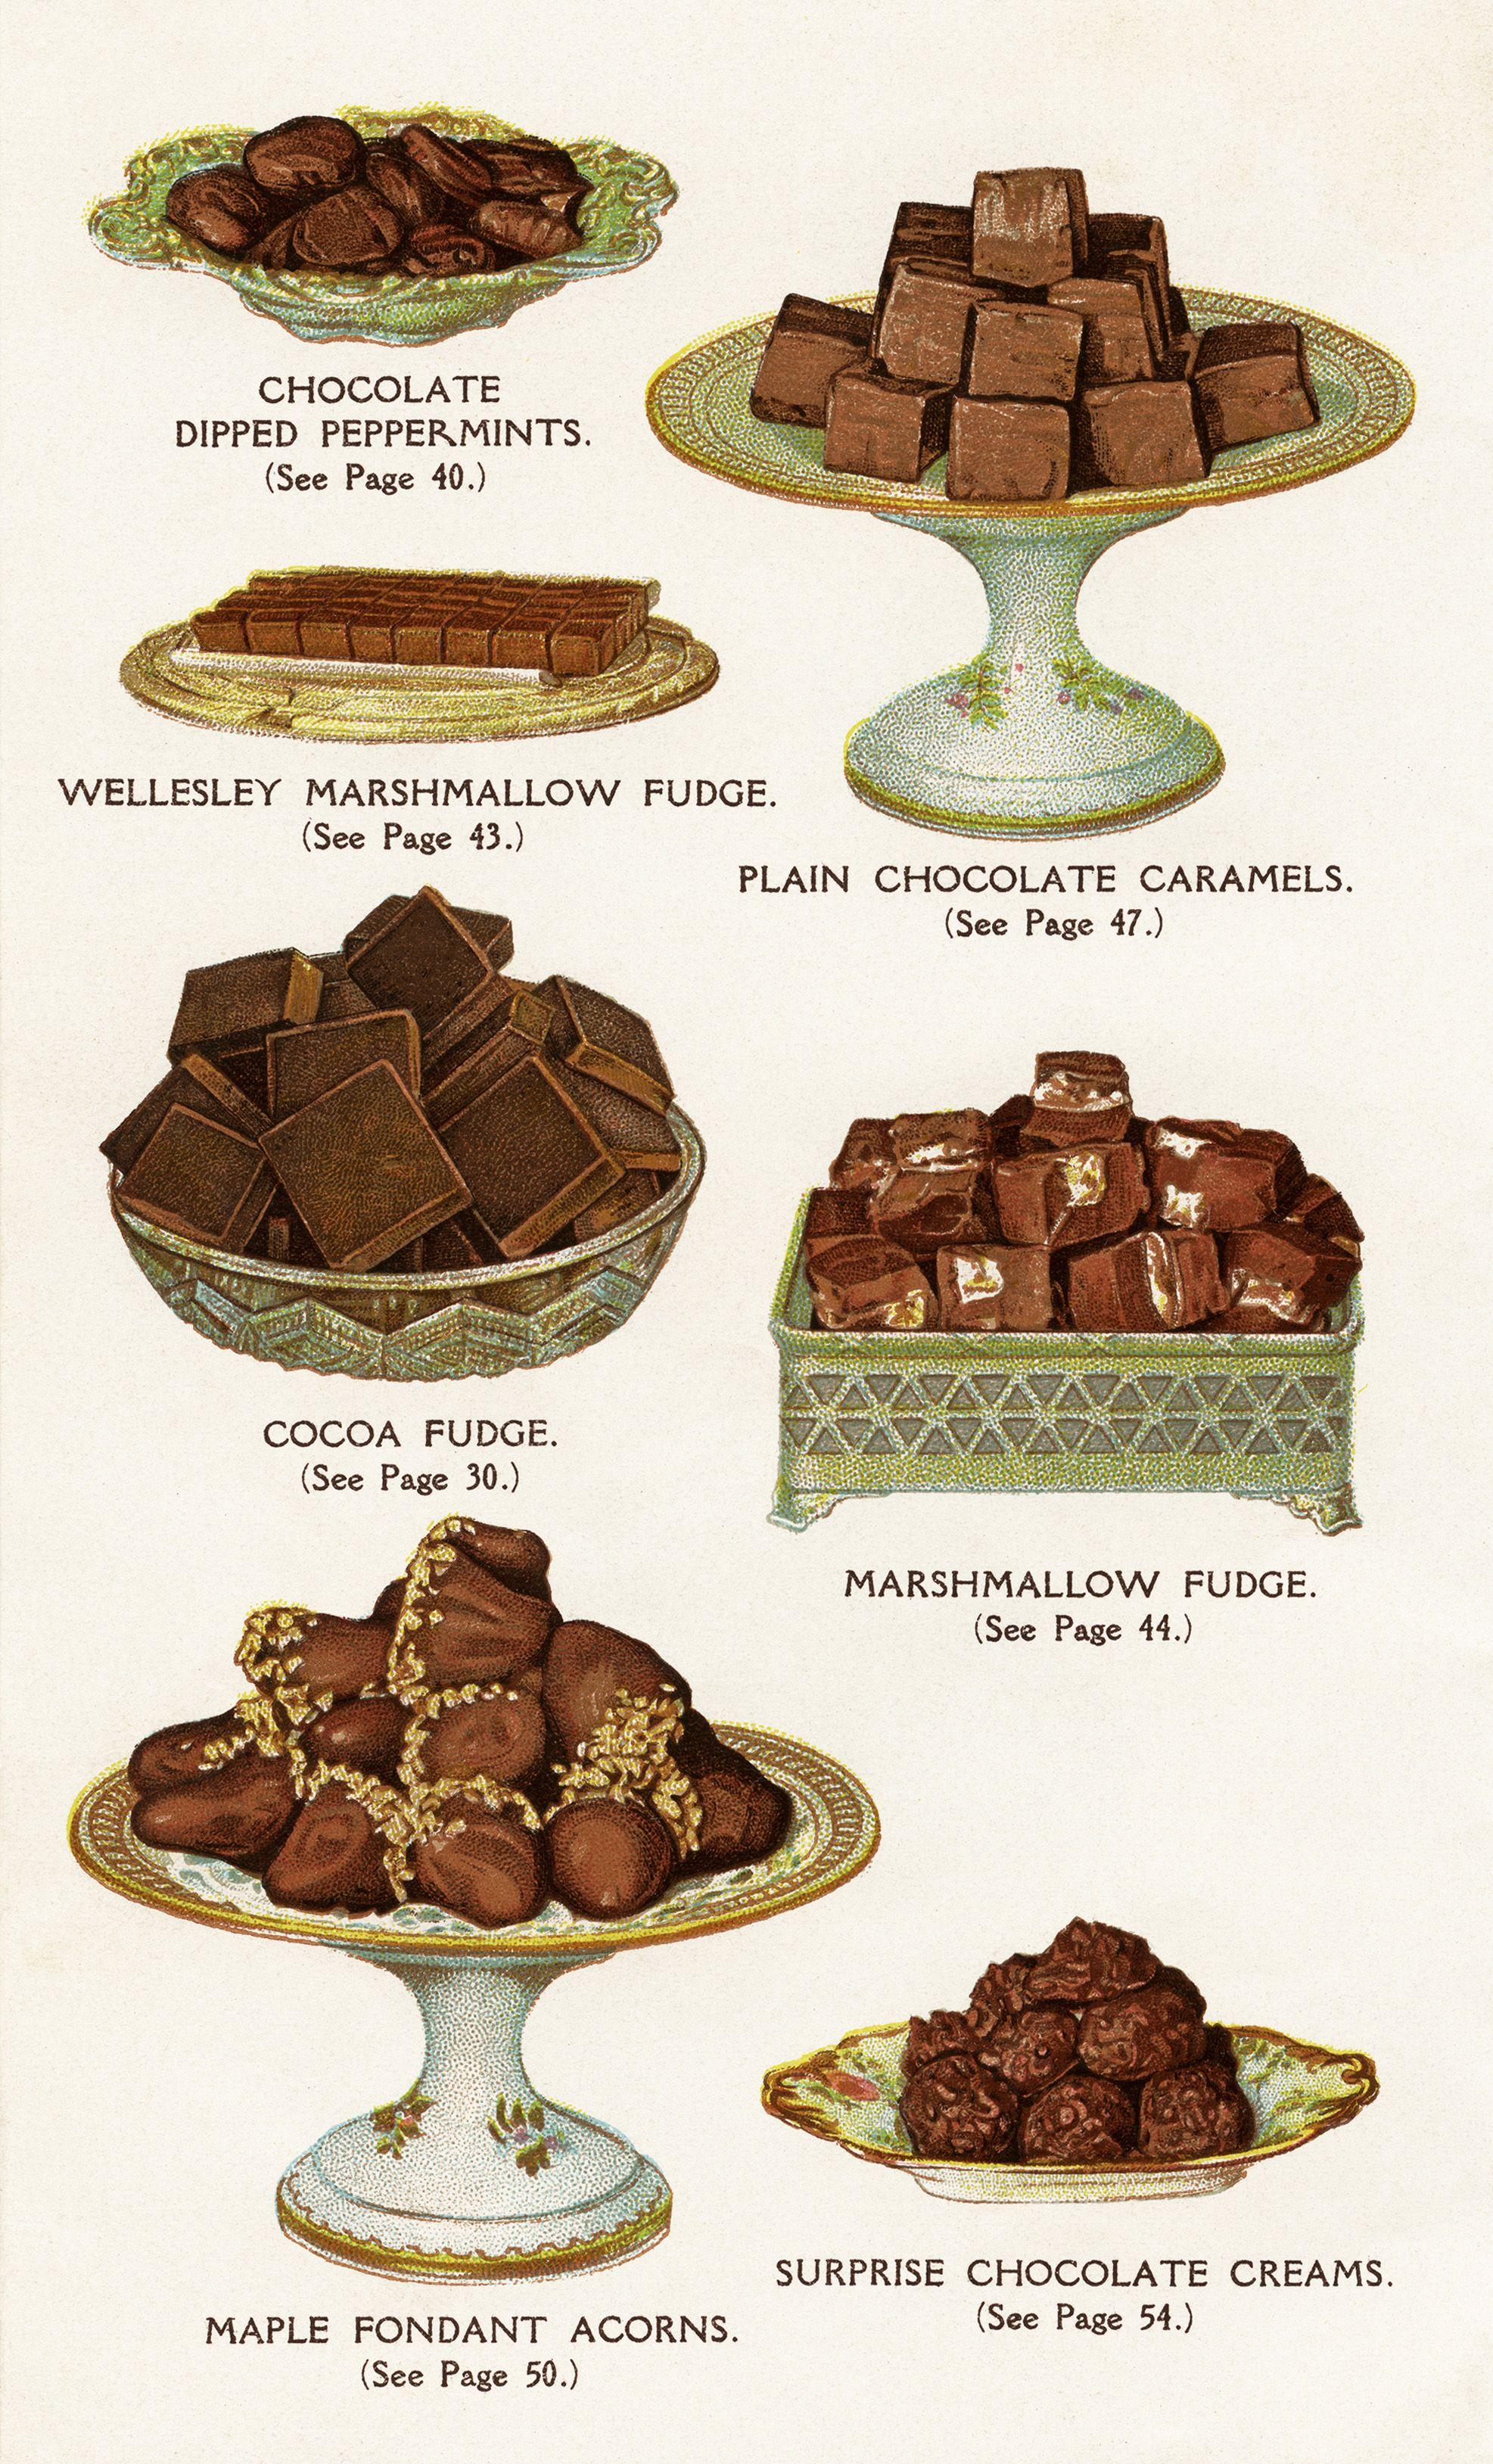 Chocolate dessert image old. Desserts clipart vintage